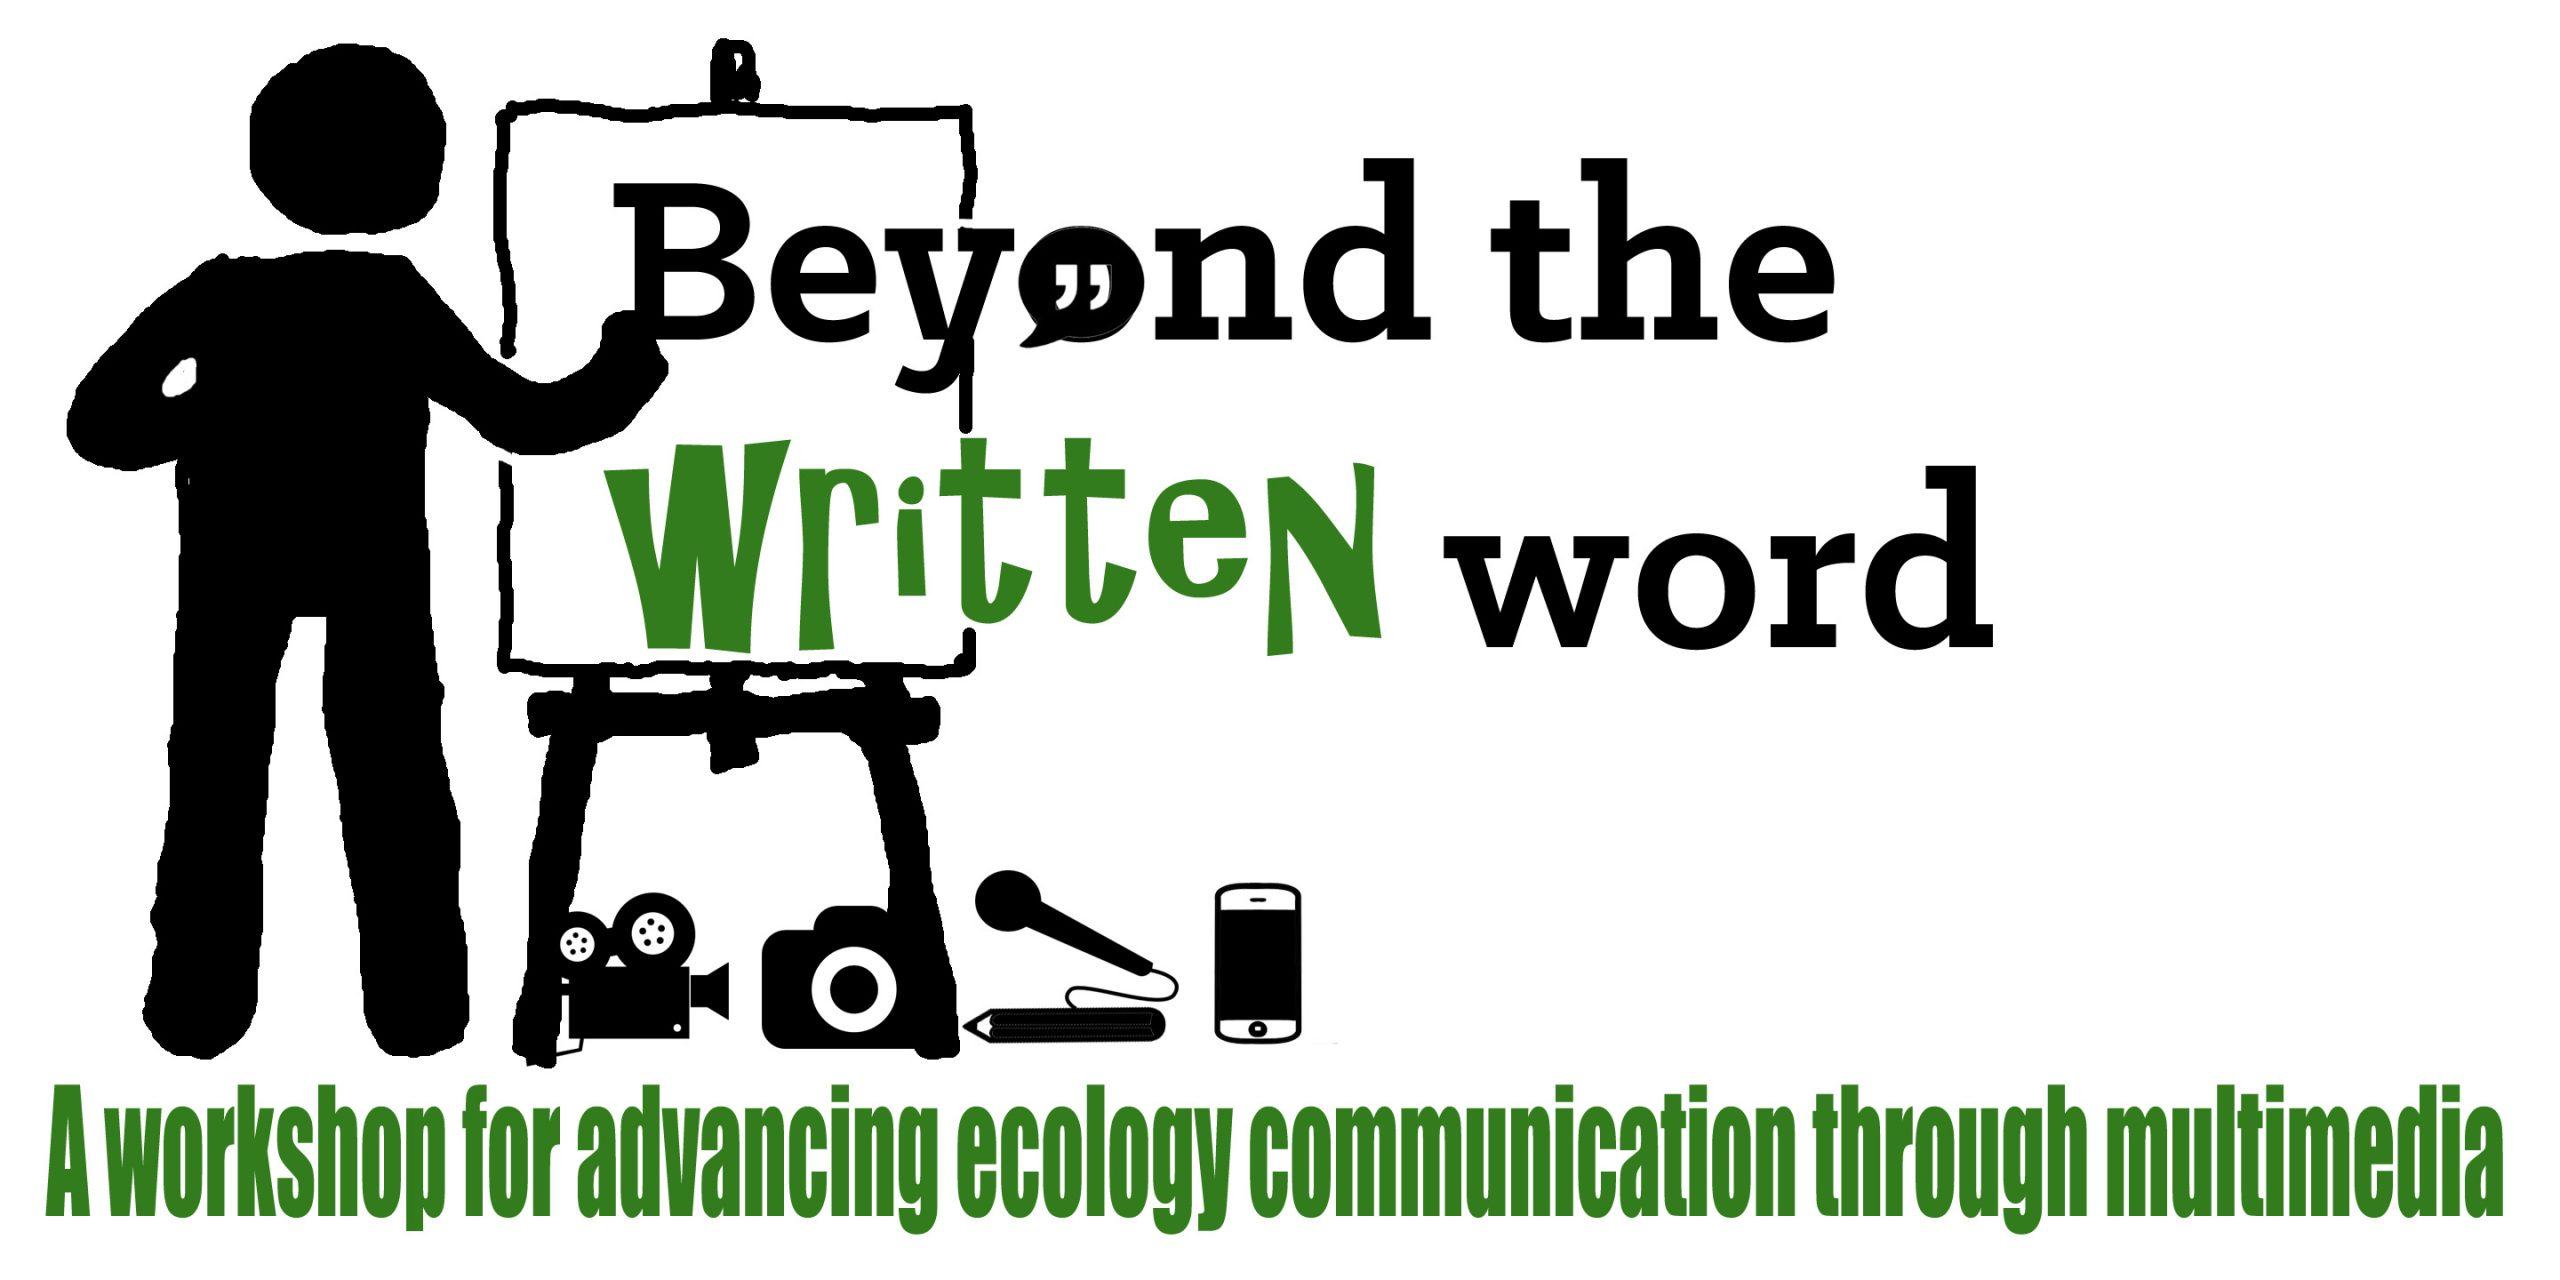 Beyond the Written Word: Advancing ecology communication through multimedia